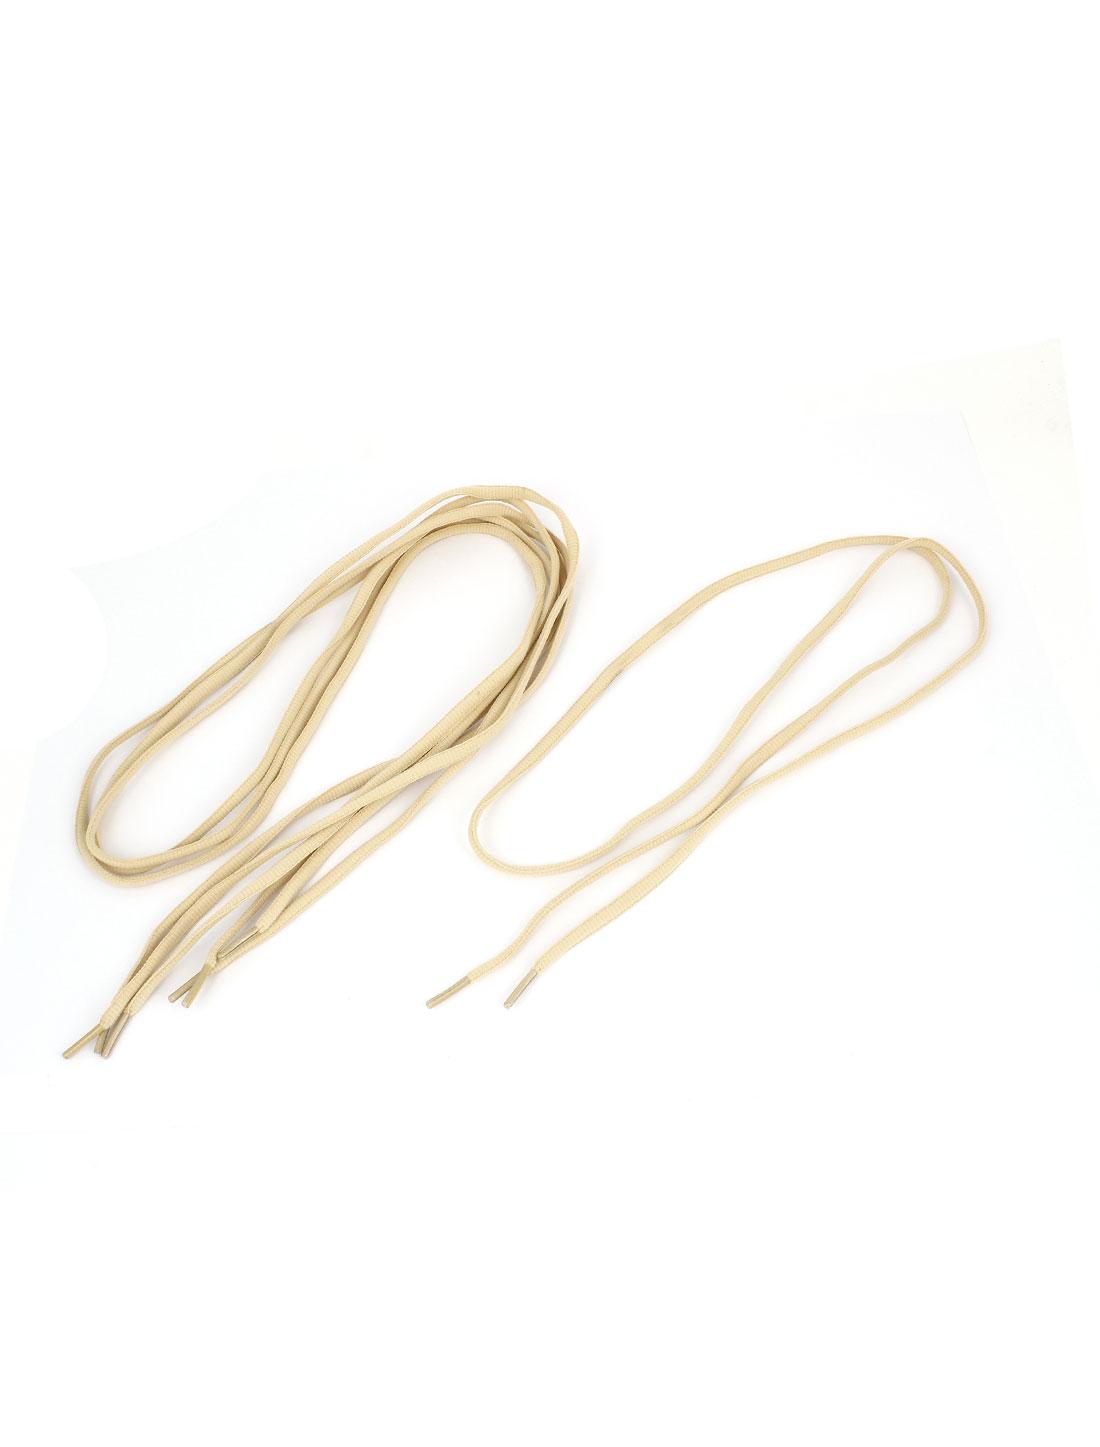 Ladies Men Sneakers Nylon Flat Shoelaces Shoe String Beige 116cm Length 2 Pairs